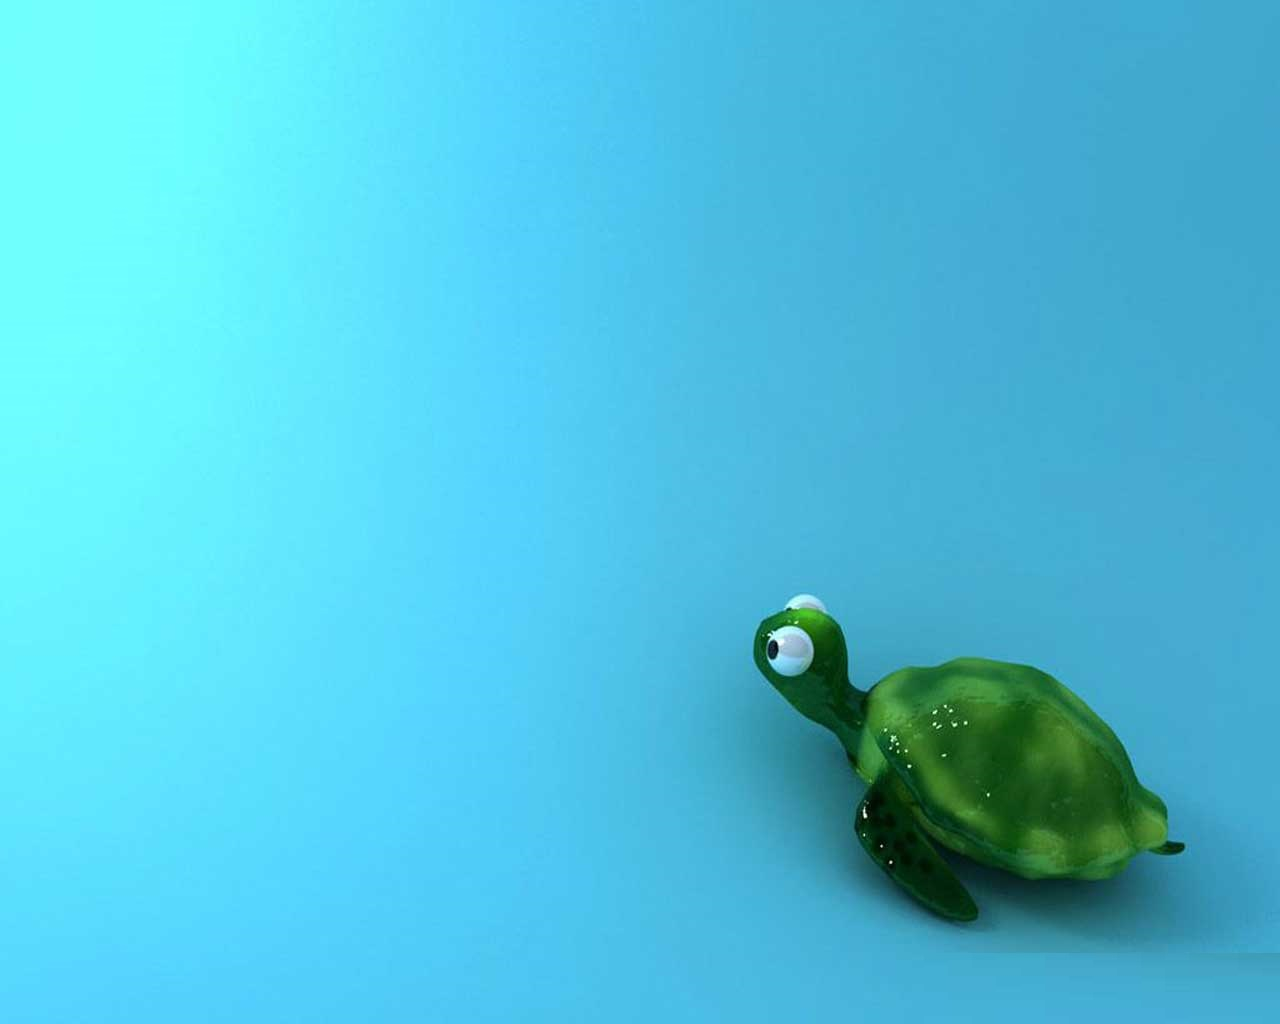 Cute Baby Turtle   Cute Wallpapers 1280x1024